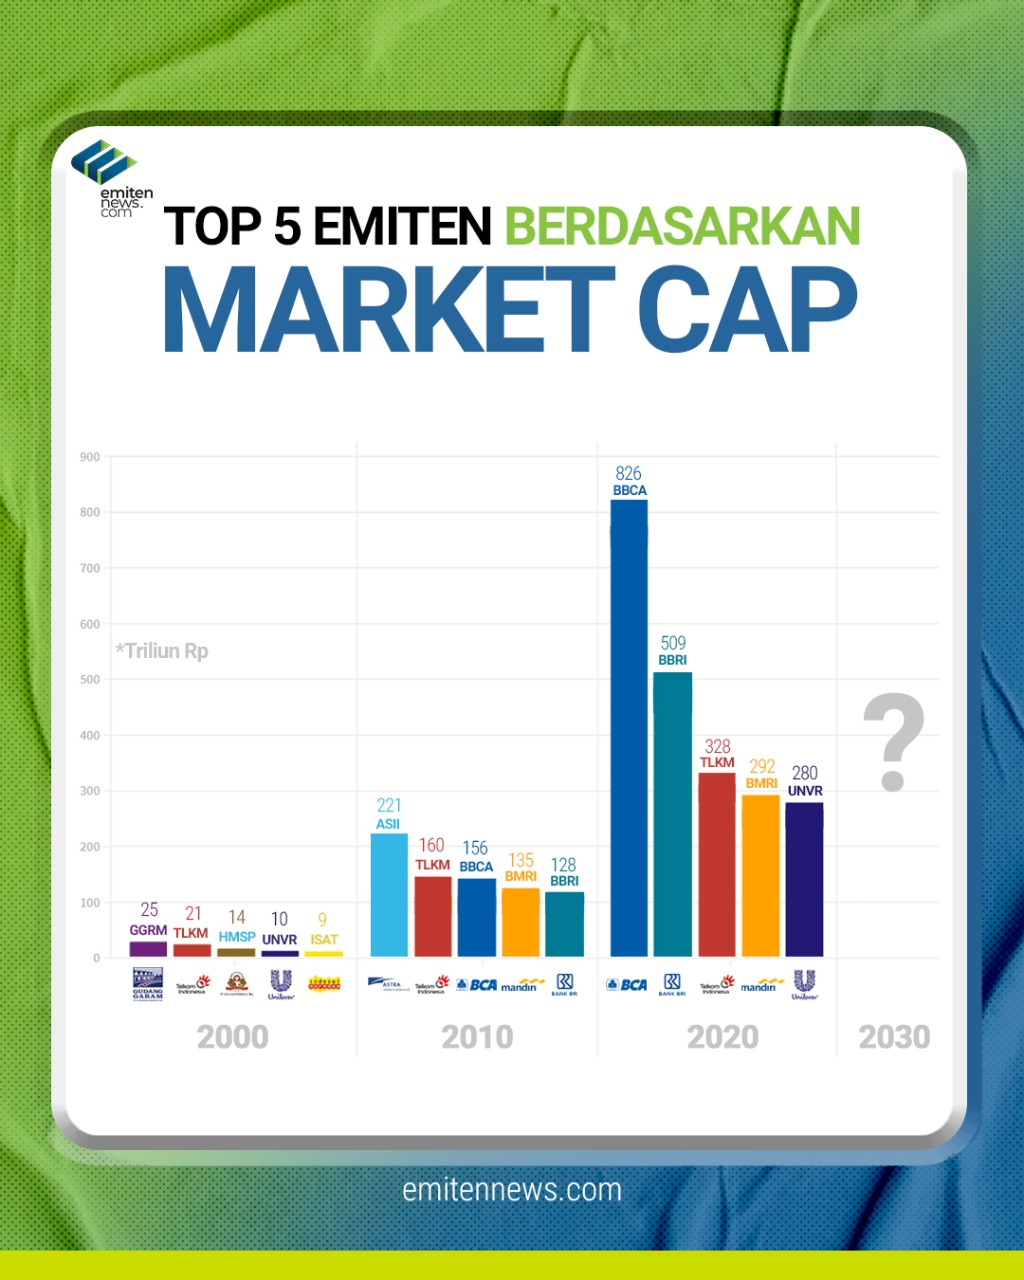 Top 5 Emiten Berdasarkan Market Cap